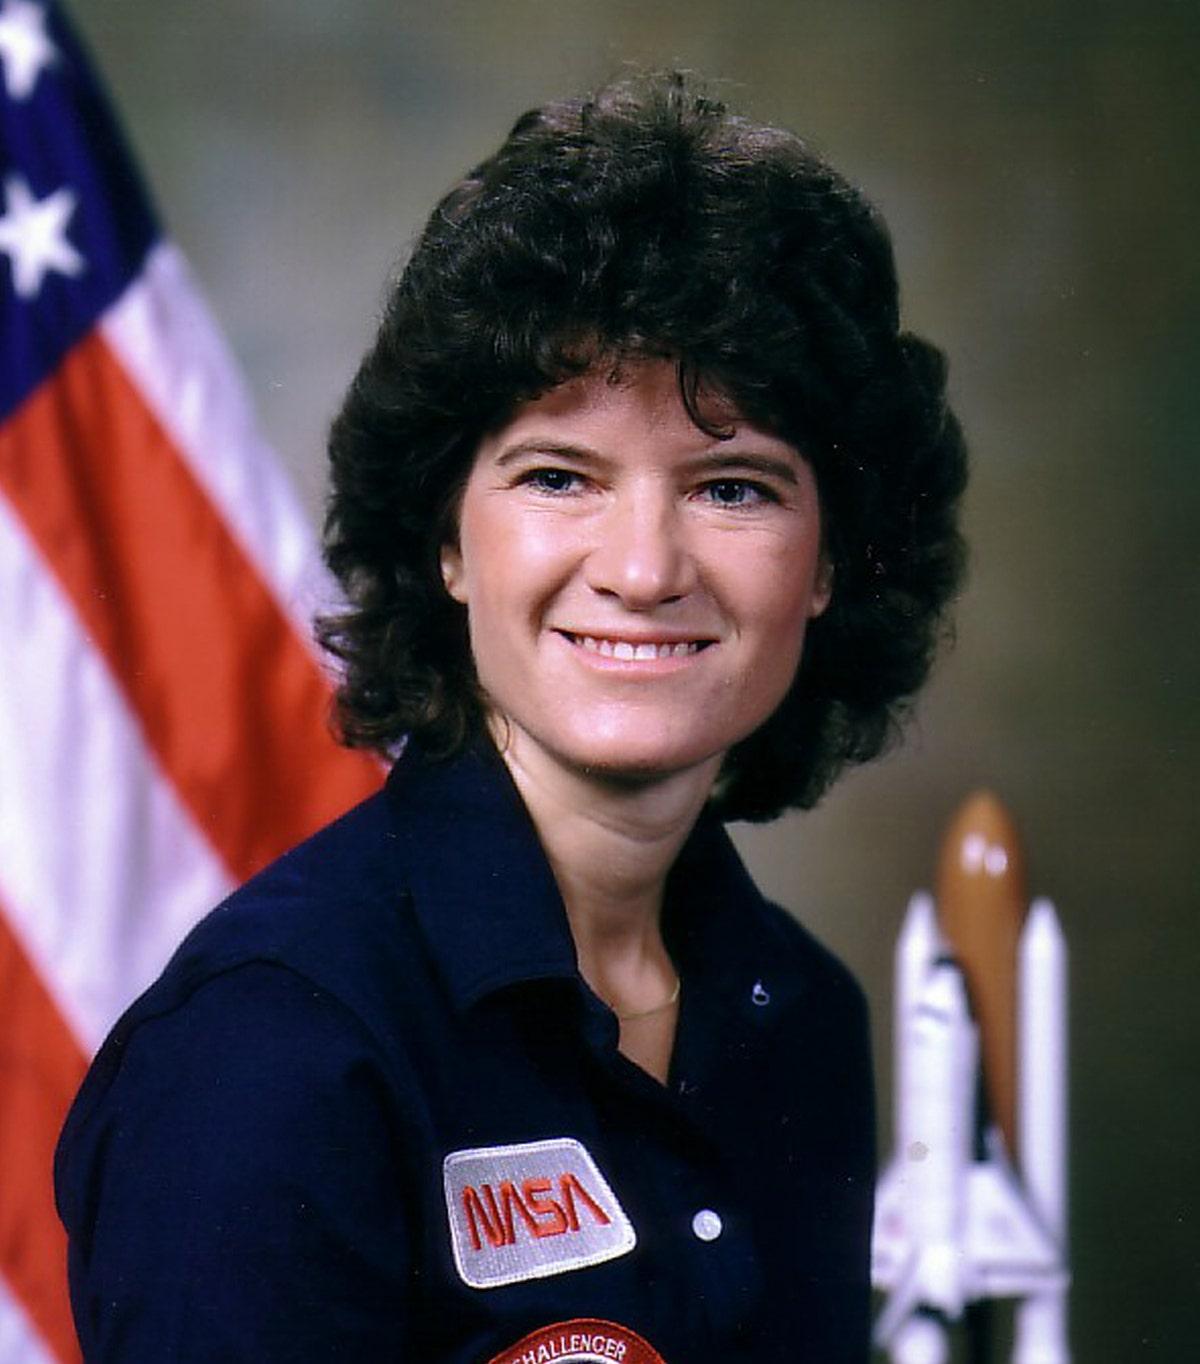 Black female astronaut died